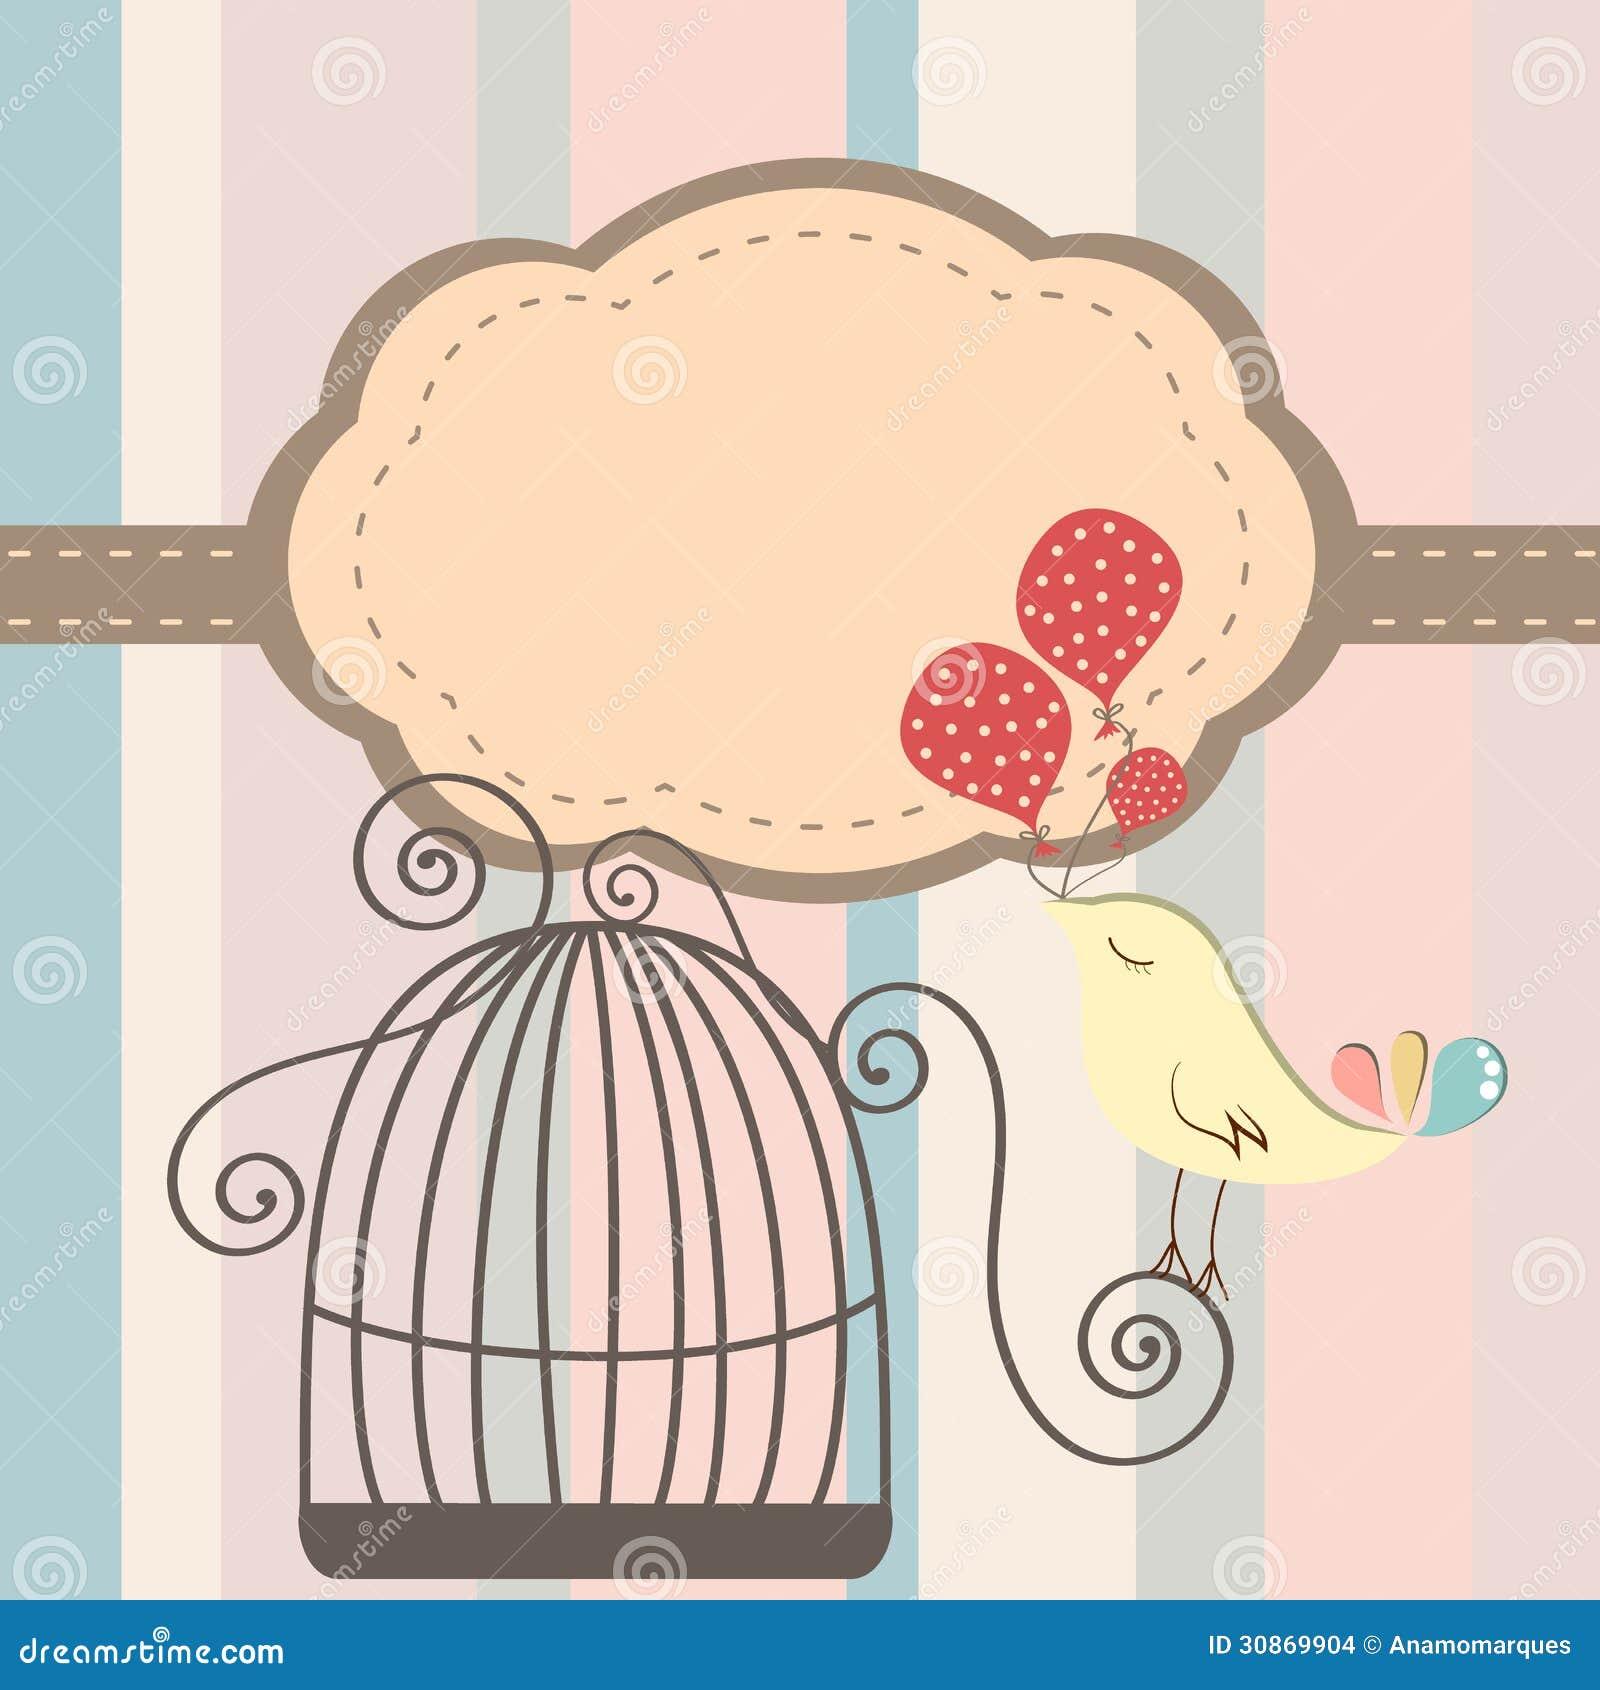 Love Bird Wedding Invitations is luxury invitation layout